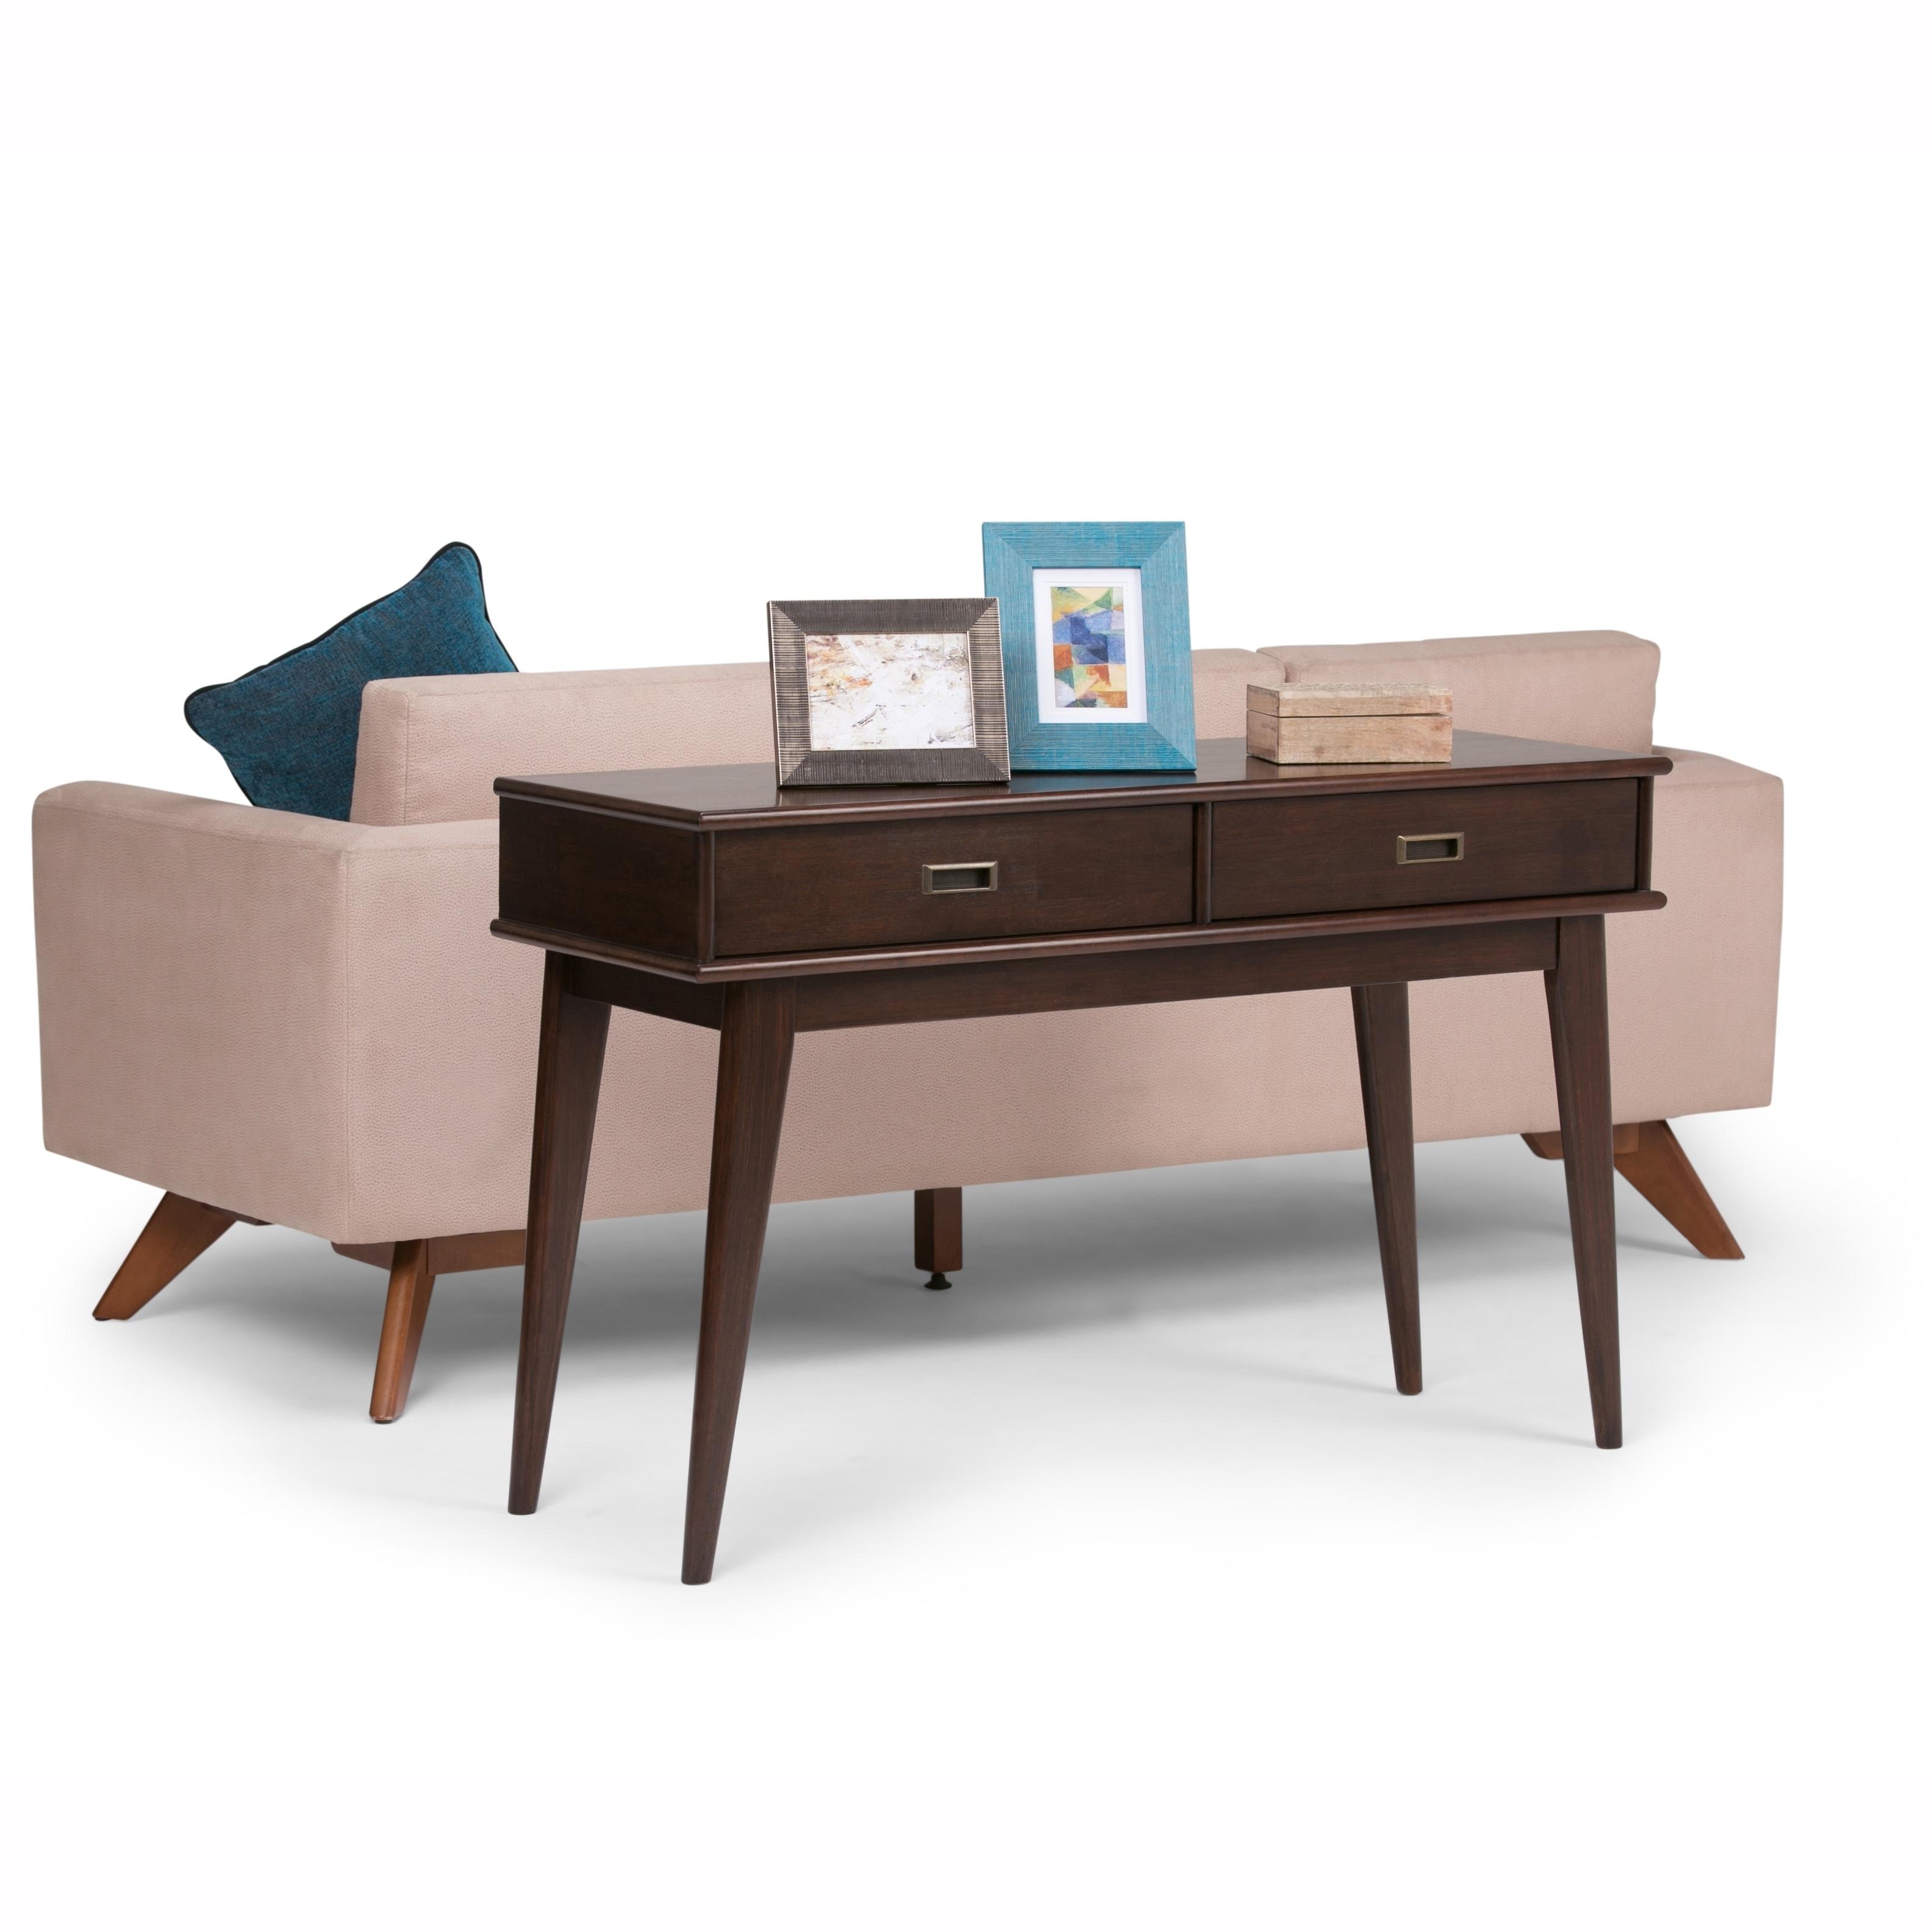 Amazing Wyndenhall Tierney Solid Hardwood 48 Inch Wide Mid Century Modern Console Sofa Table Creativecarmelina Interior Chair Design Creativecarmelinacom